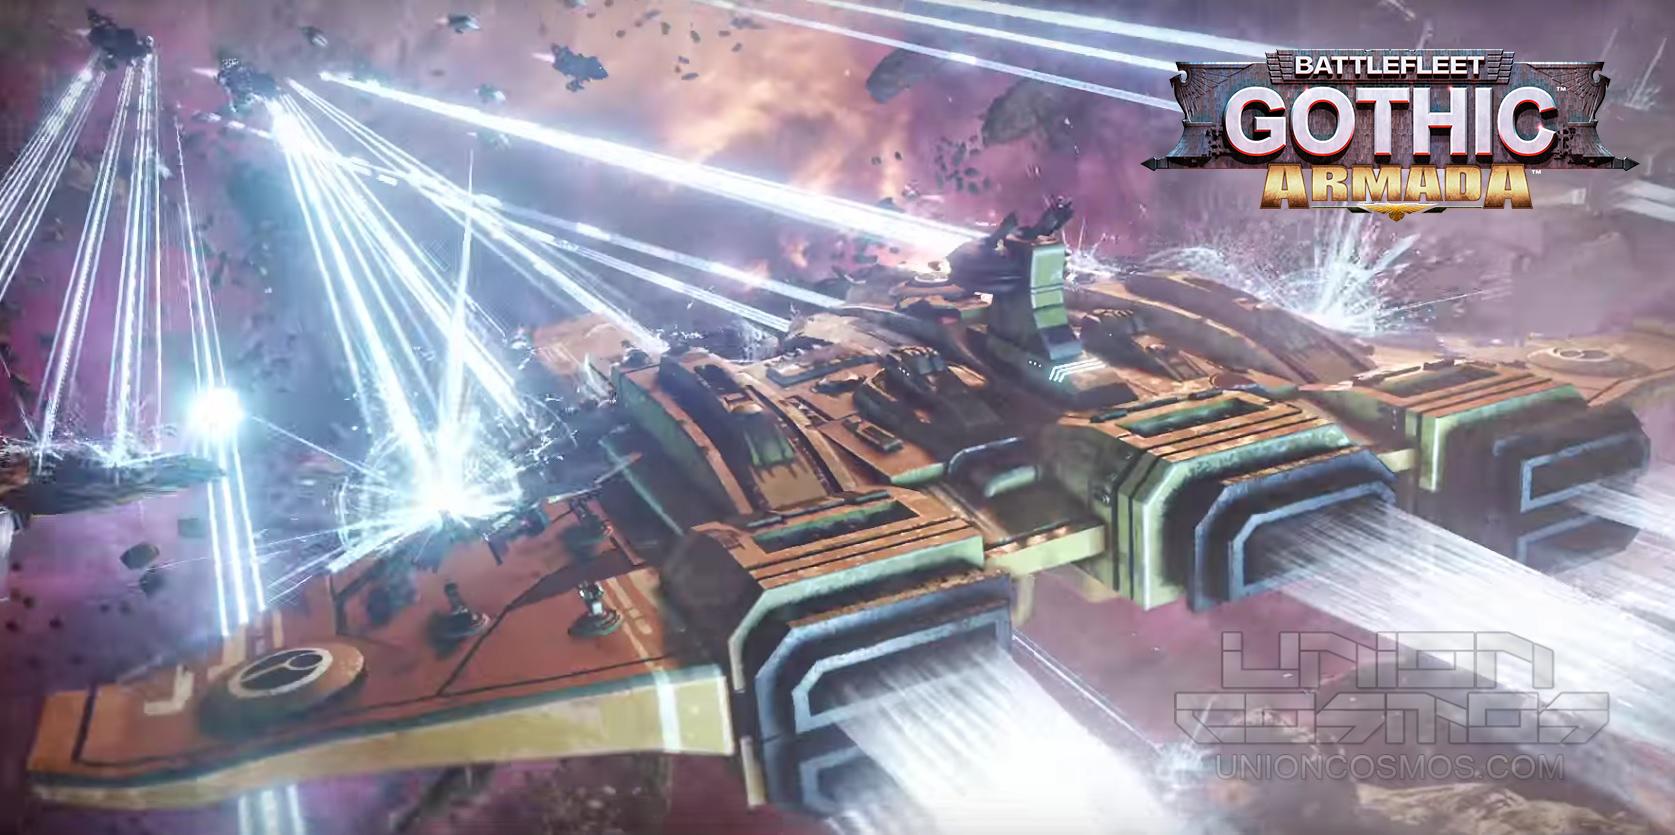 union-cosmos-battlefleet-gothic-armada-tau-empire-naves